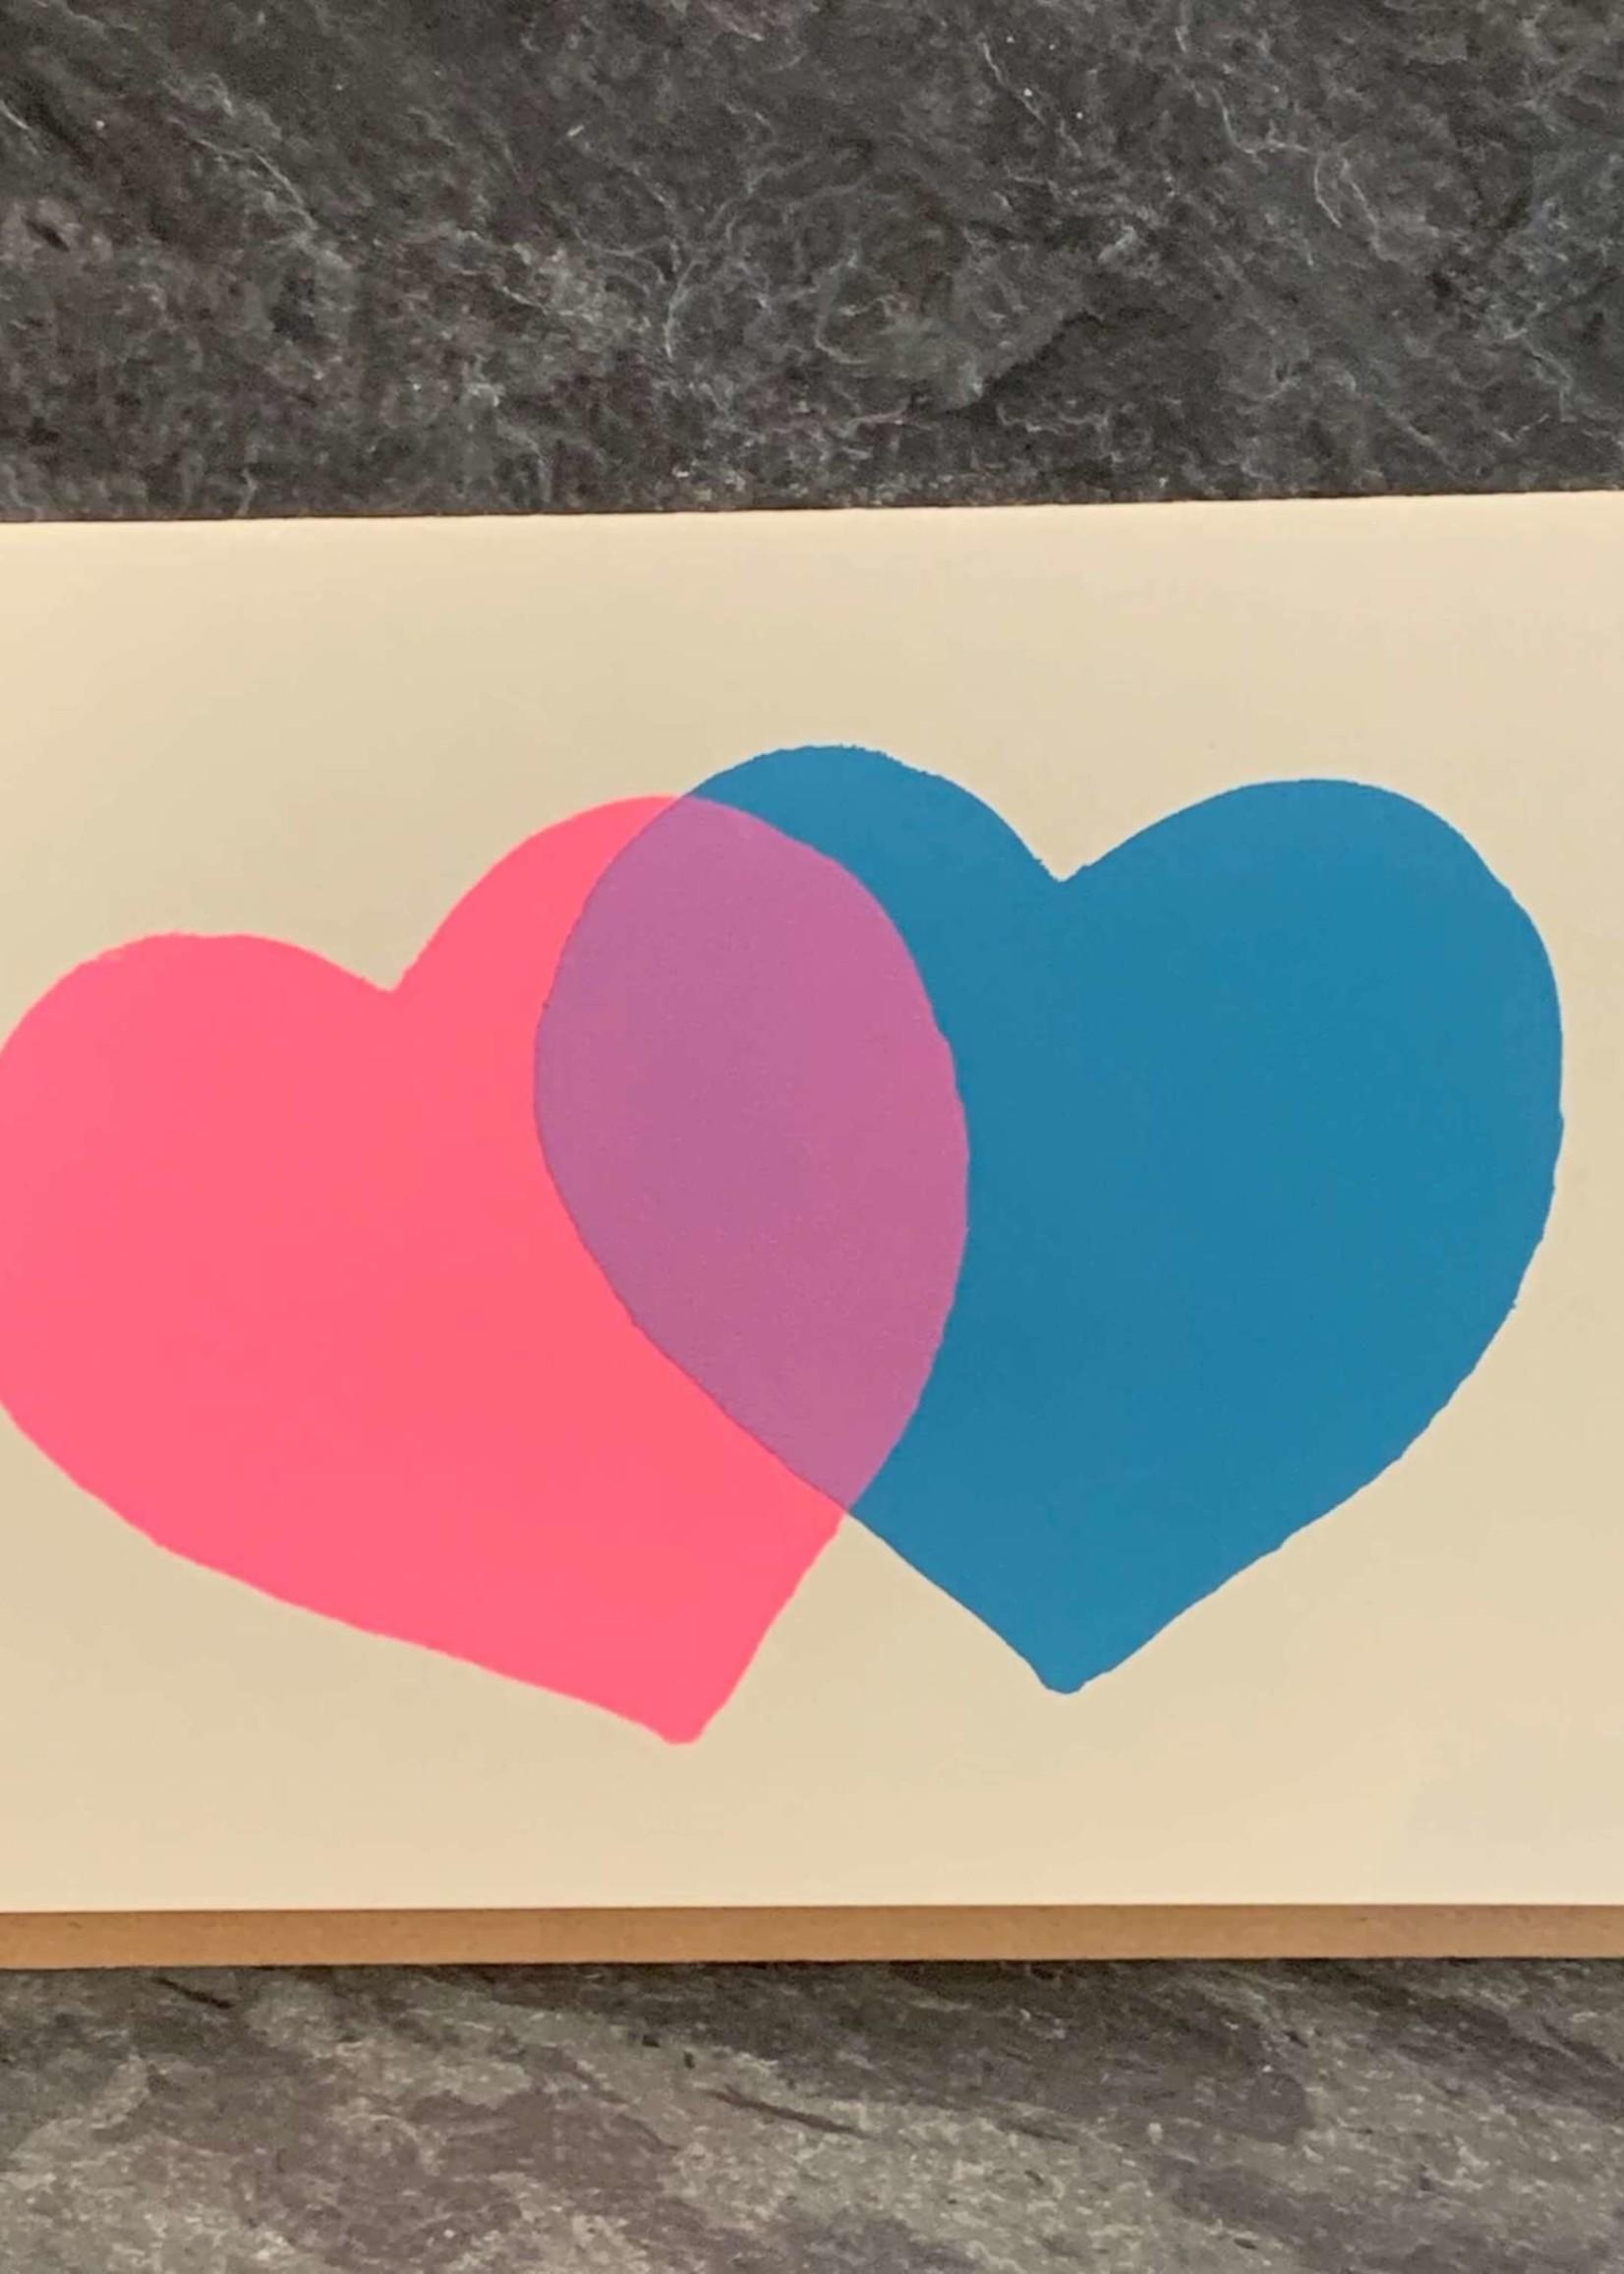 Gold Teeth Brooklyn 2 Hearts Anniversary/Love Card